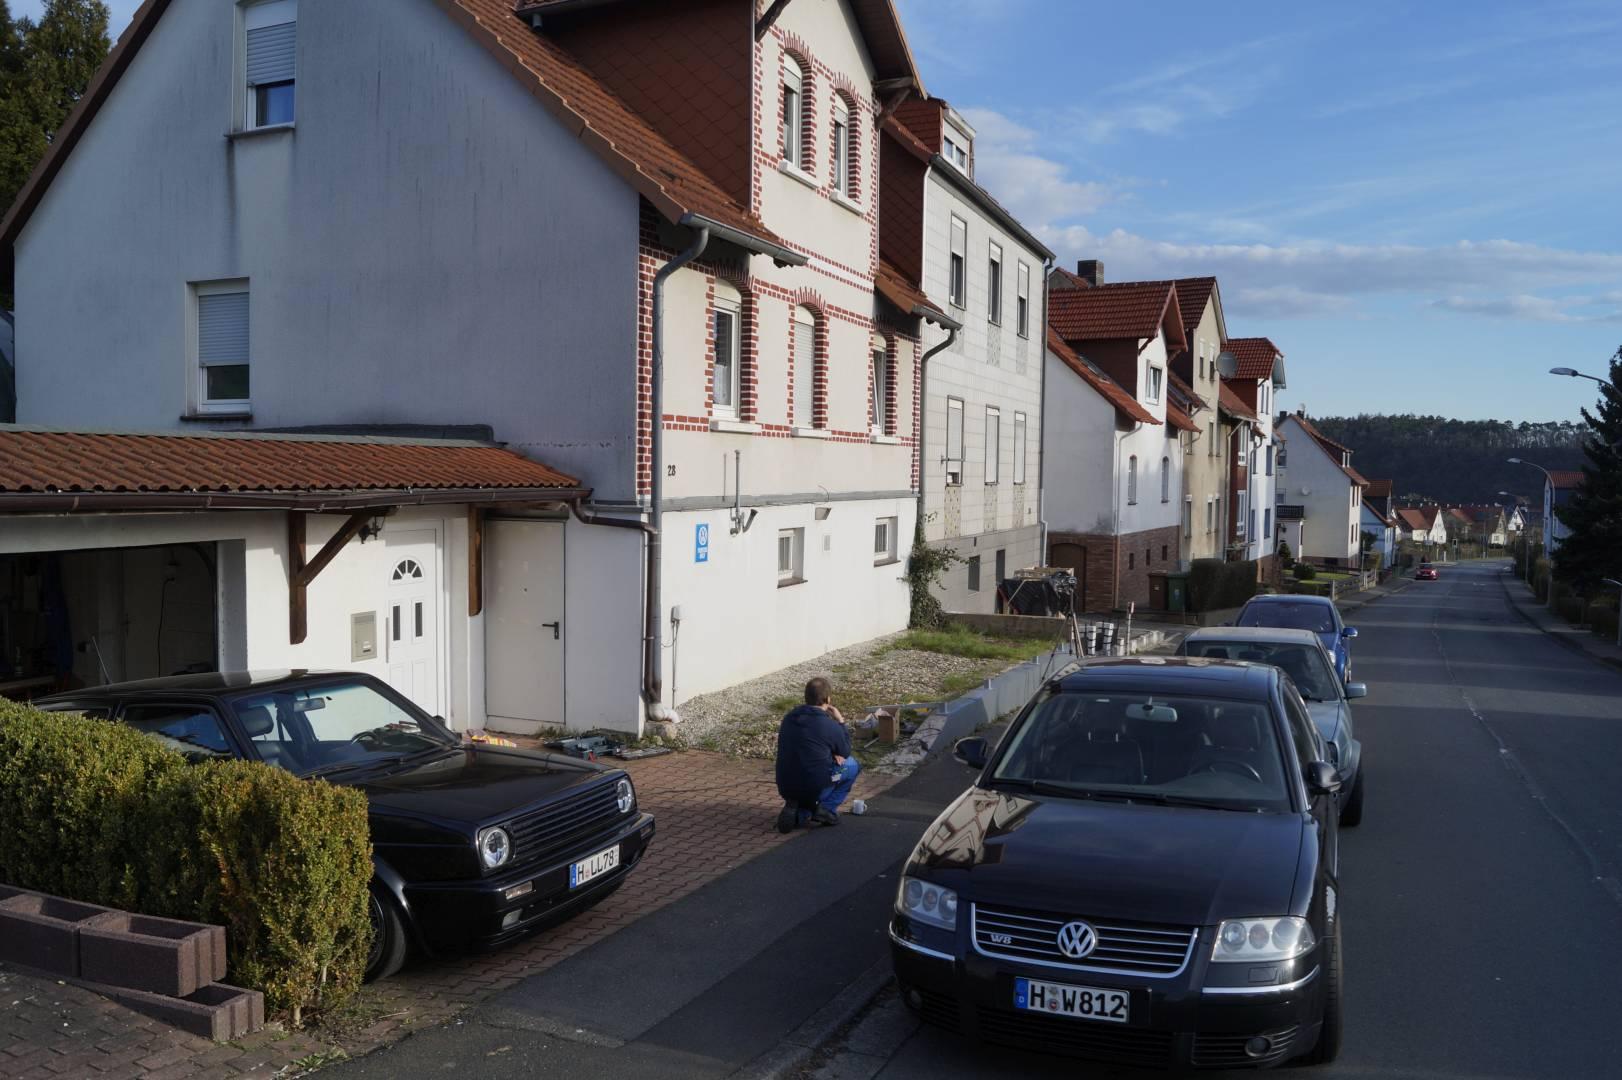 Carport_Aufbau_A02.jpg